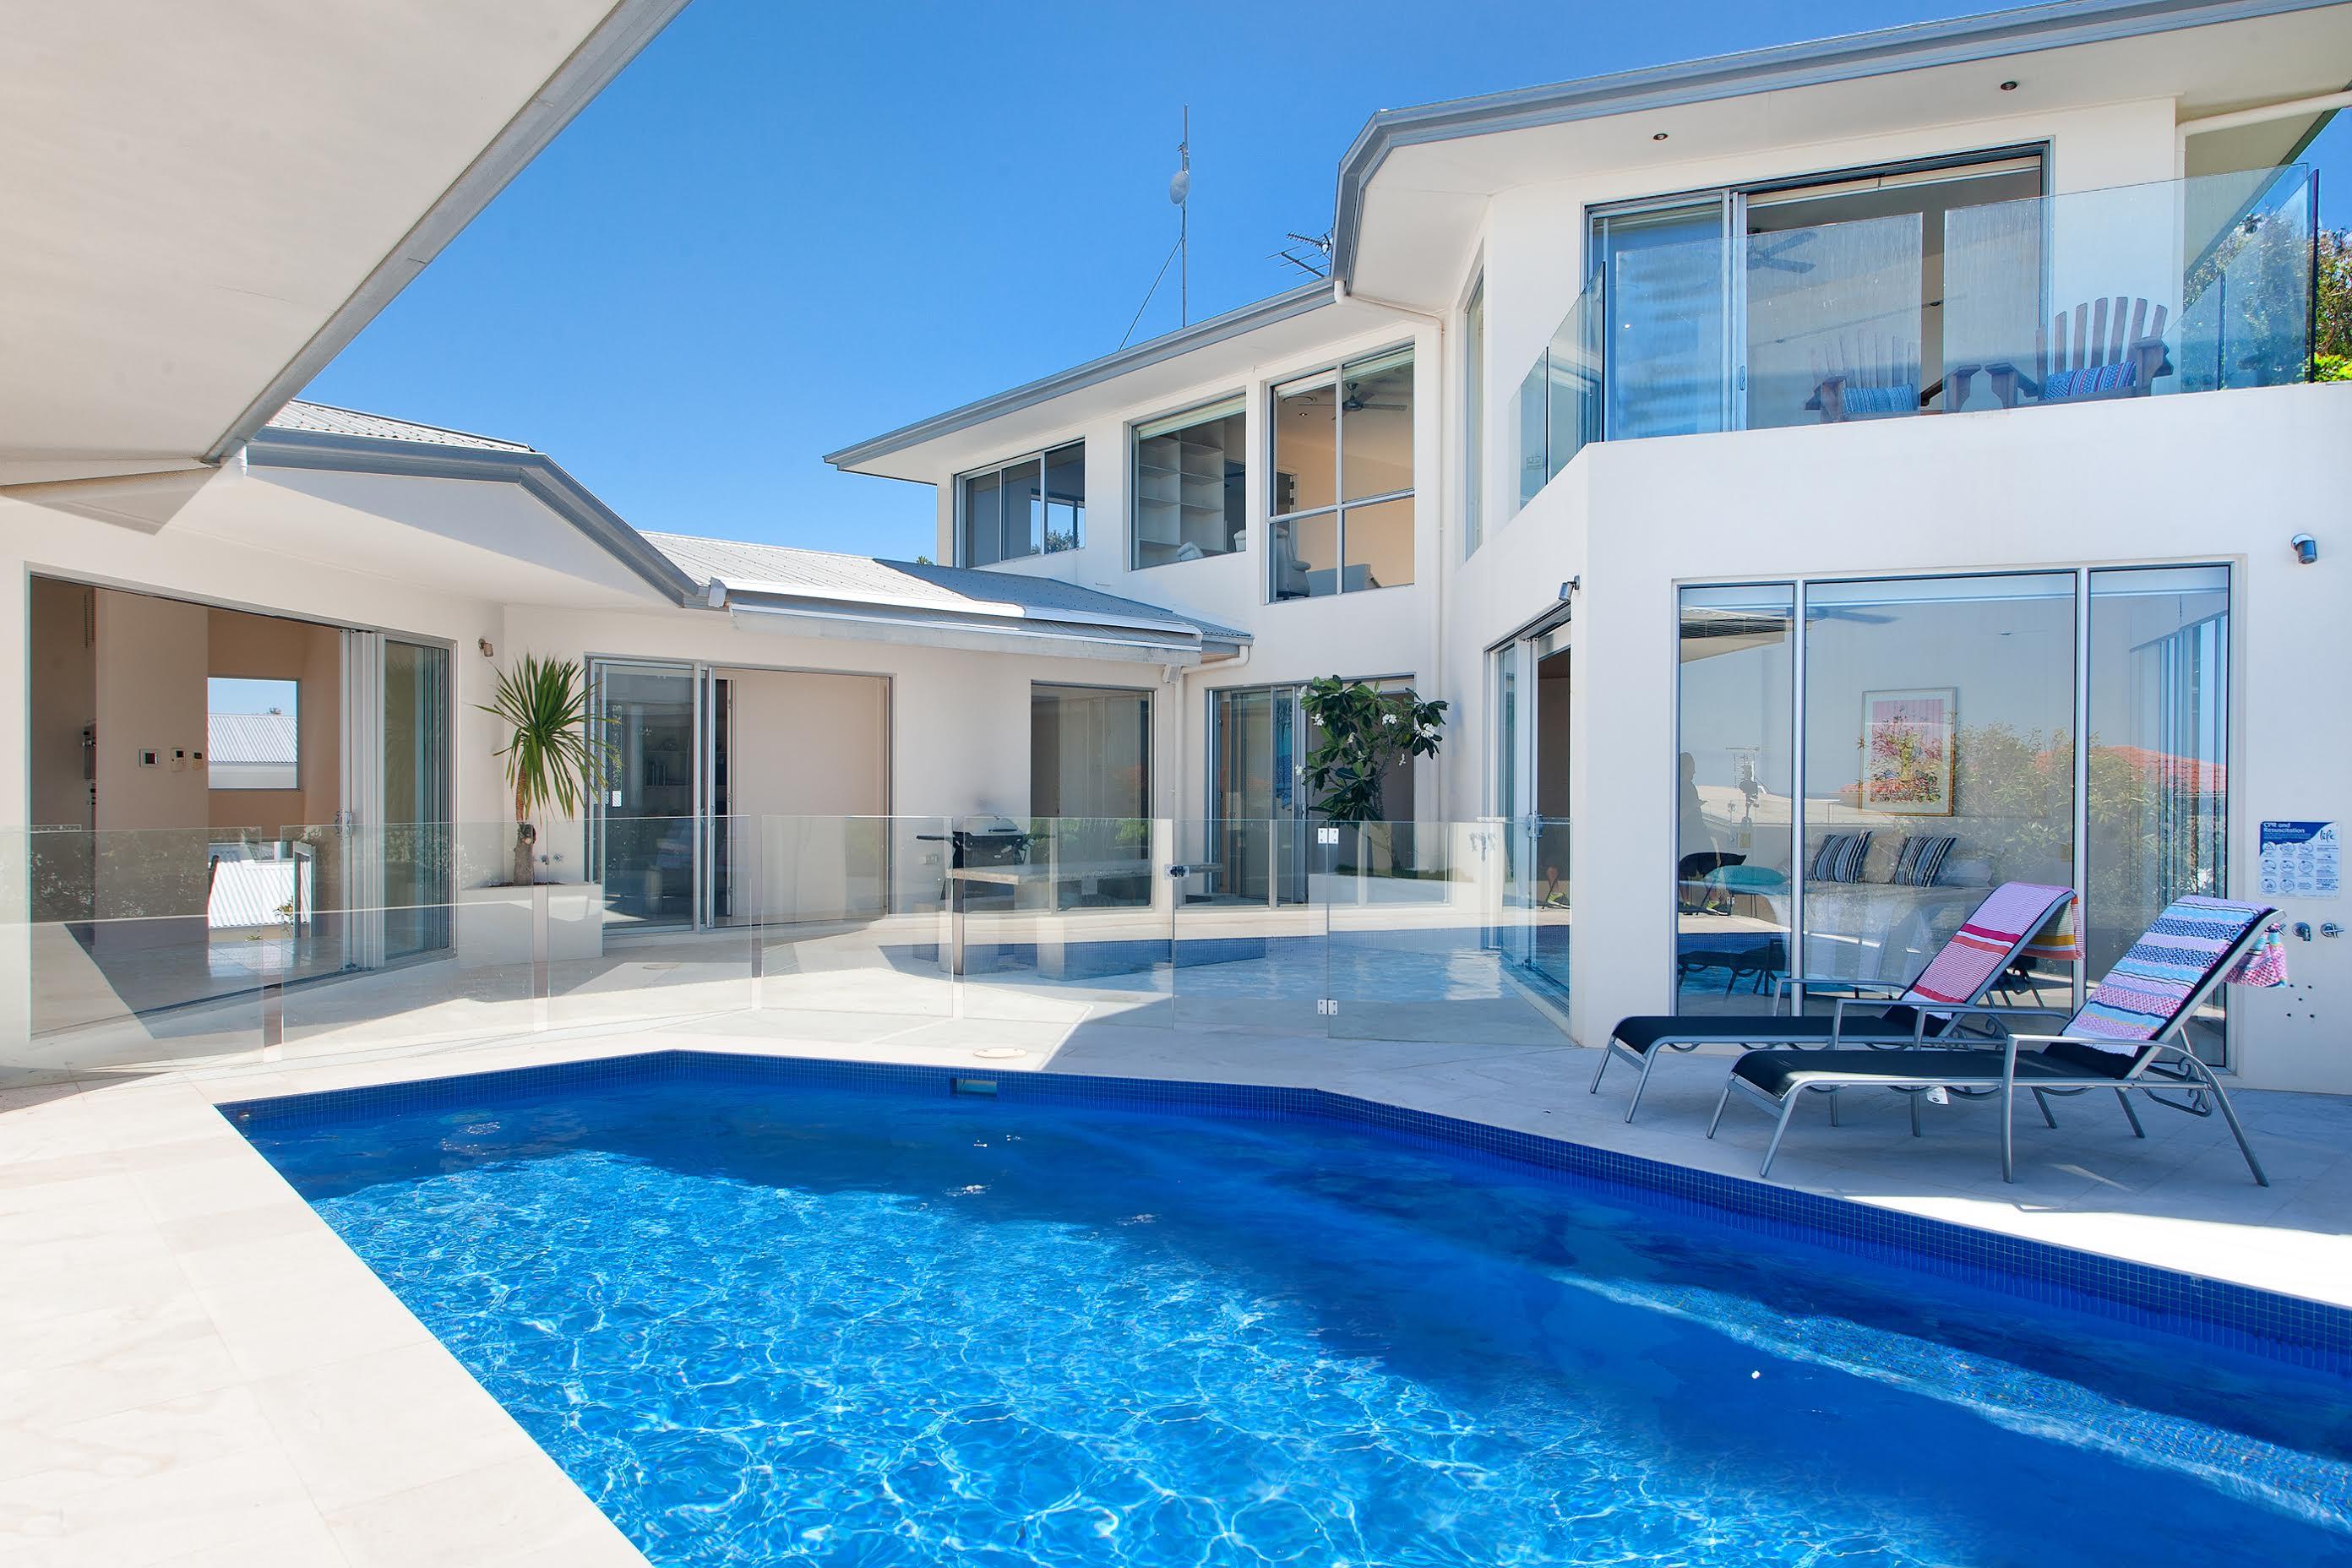 Holiday accommodation in noosa noosa luxury holidays for Luxury holidays worldwide